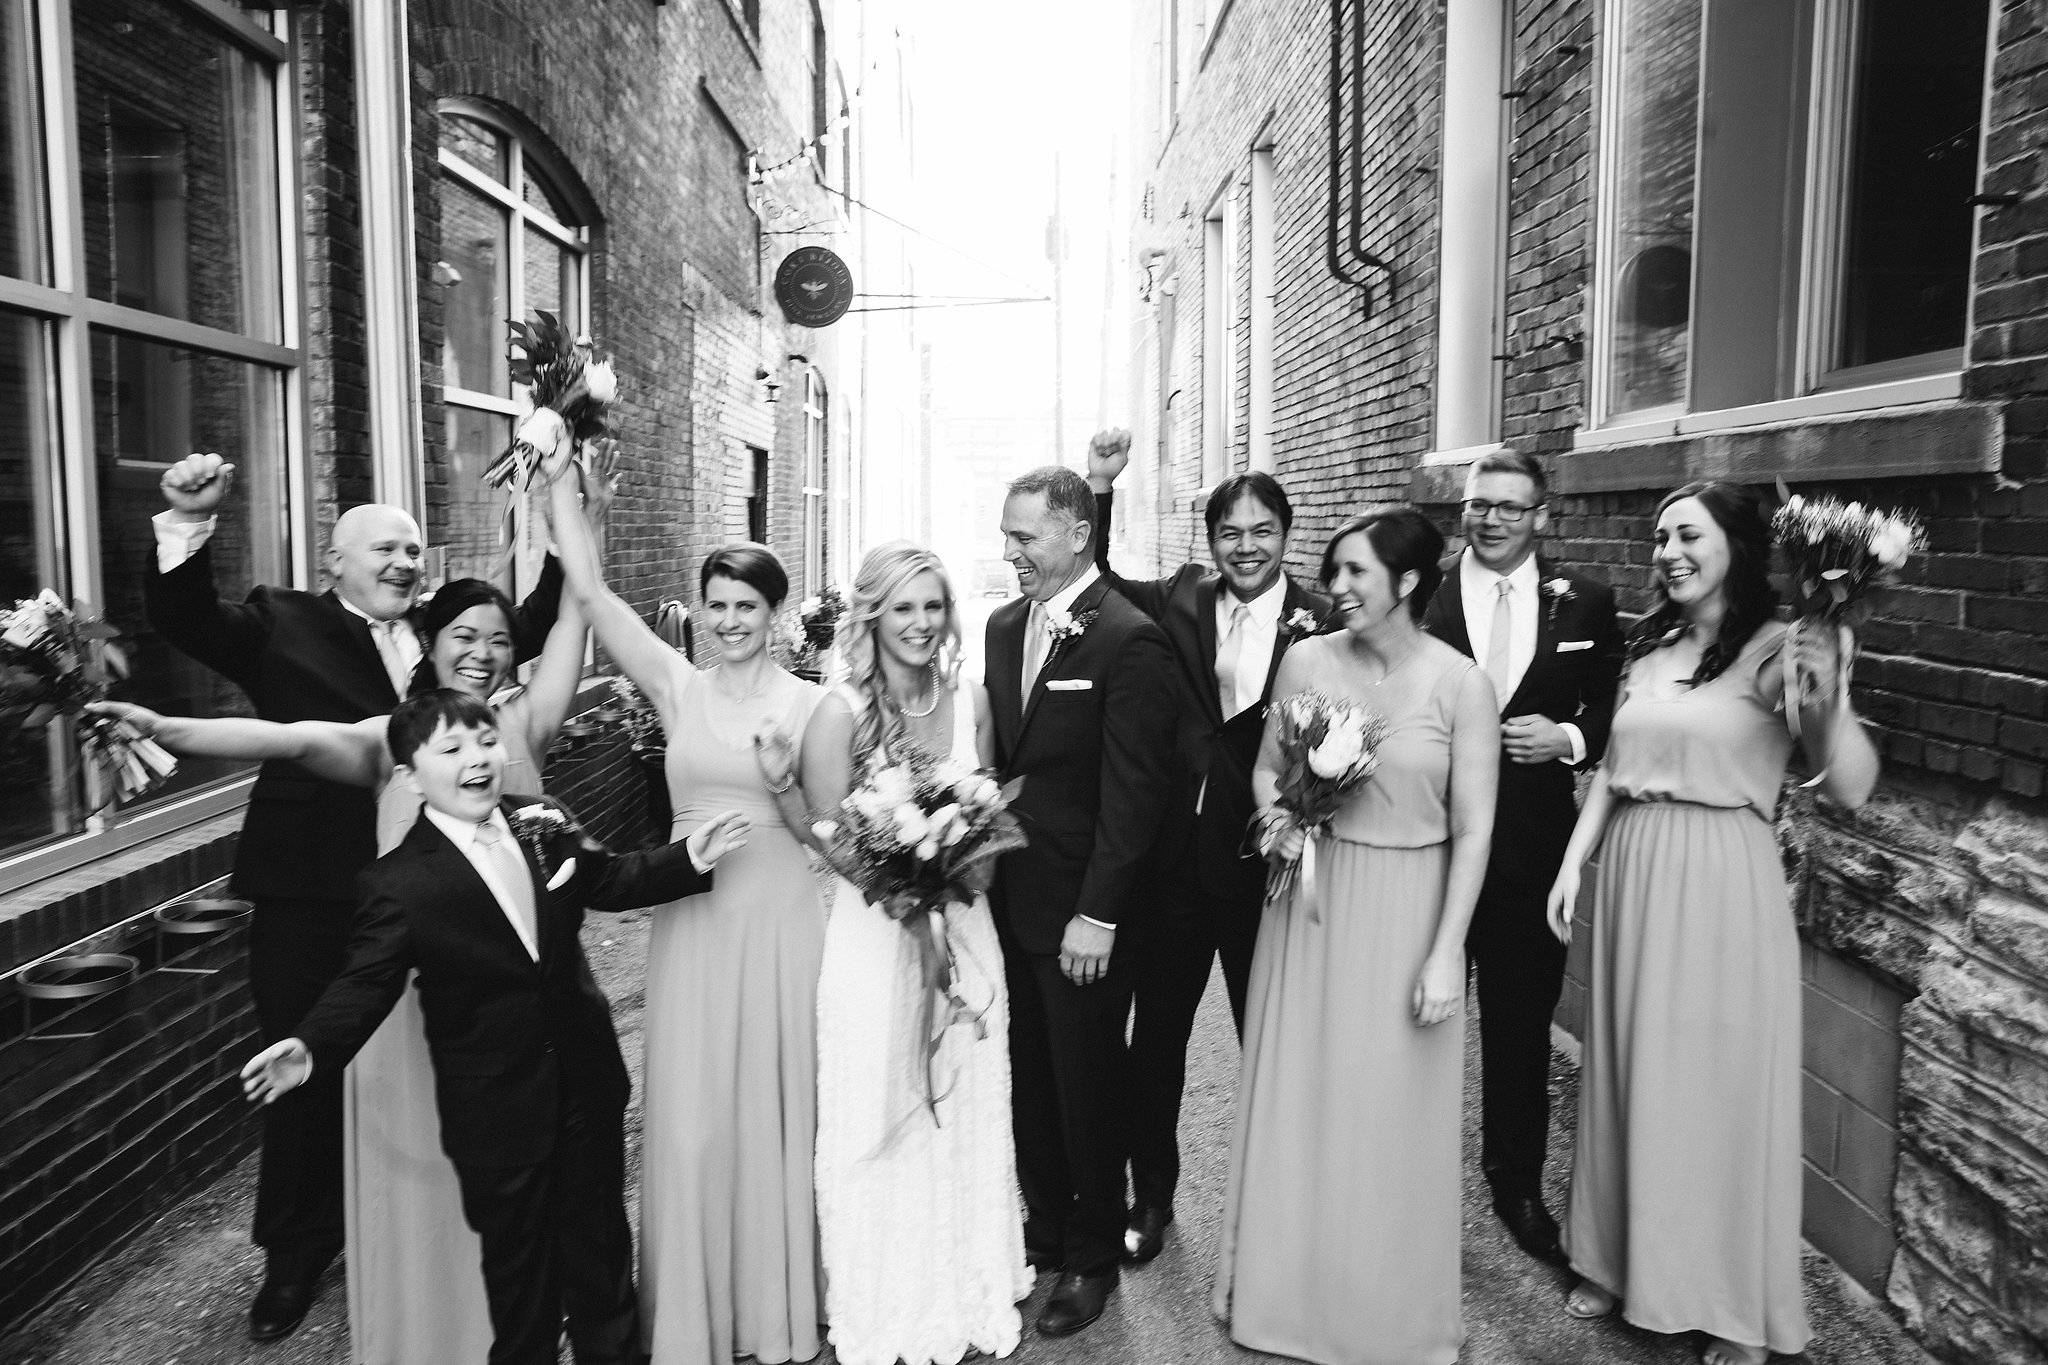 The Bride and The Bauer Wedding_Cinder Block Brewery Wedding_Kindling Wedding Photography_09.JPG